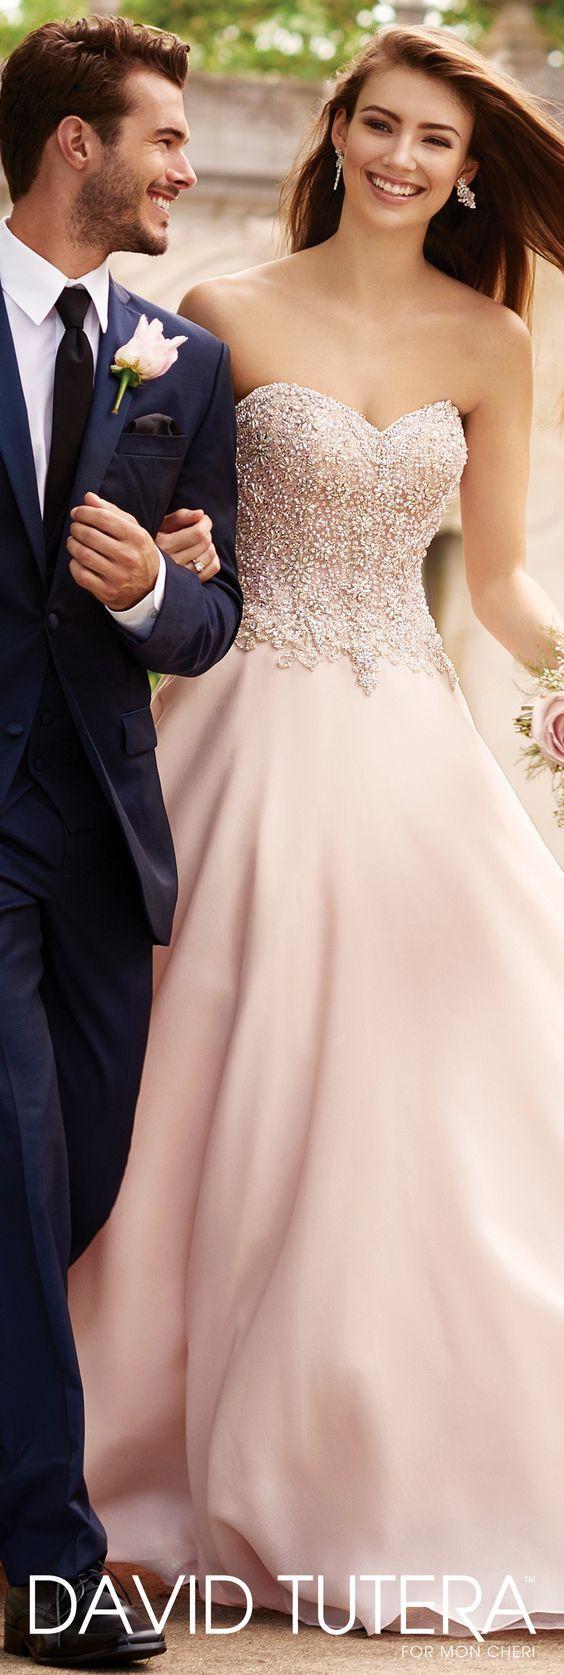 Wedding Dress by David Tutera for Mon Cheri 2017 Bridal Collection | Style No. » 117266 Adelina